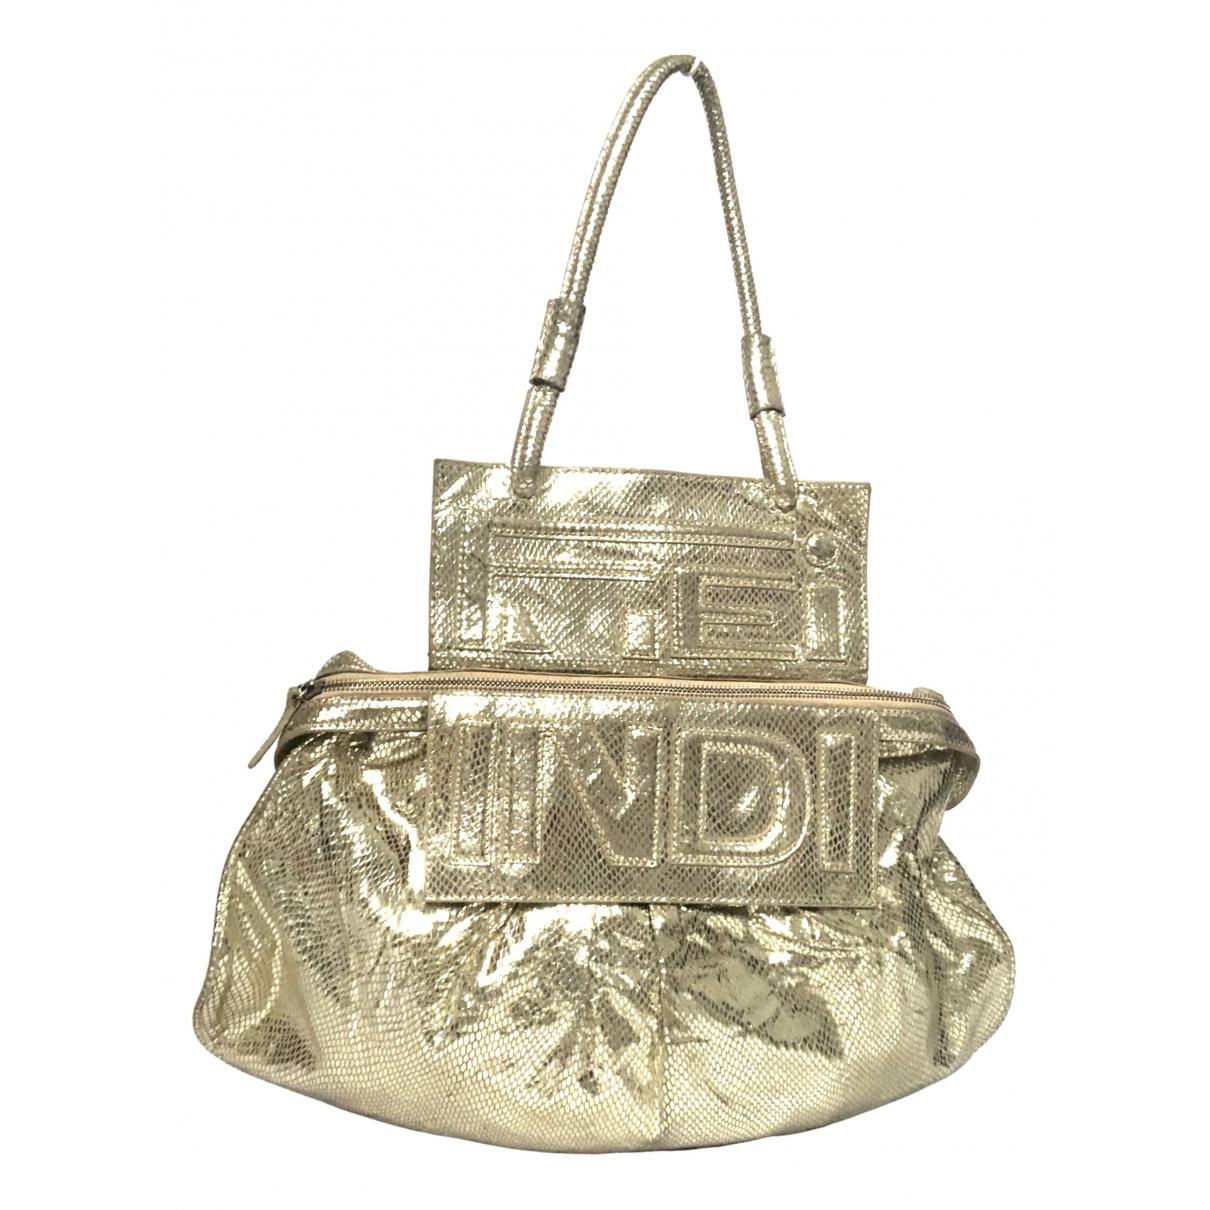 Fendi N Metallic Metal handbag for Women N